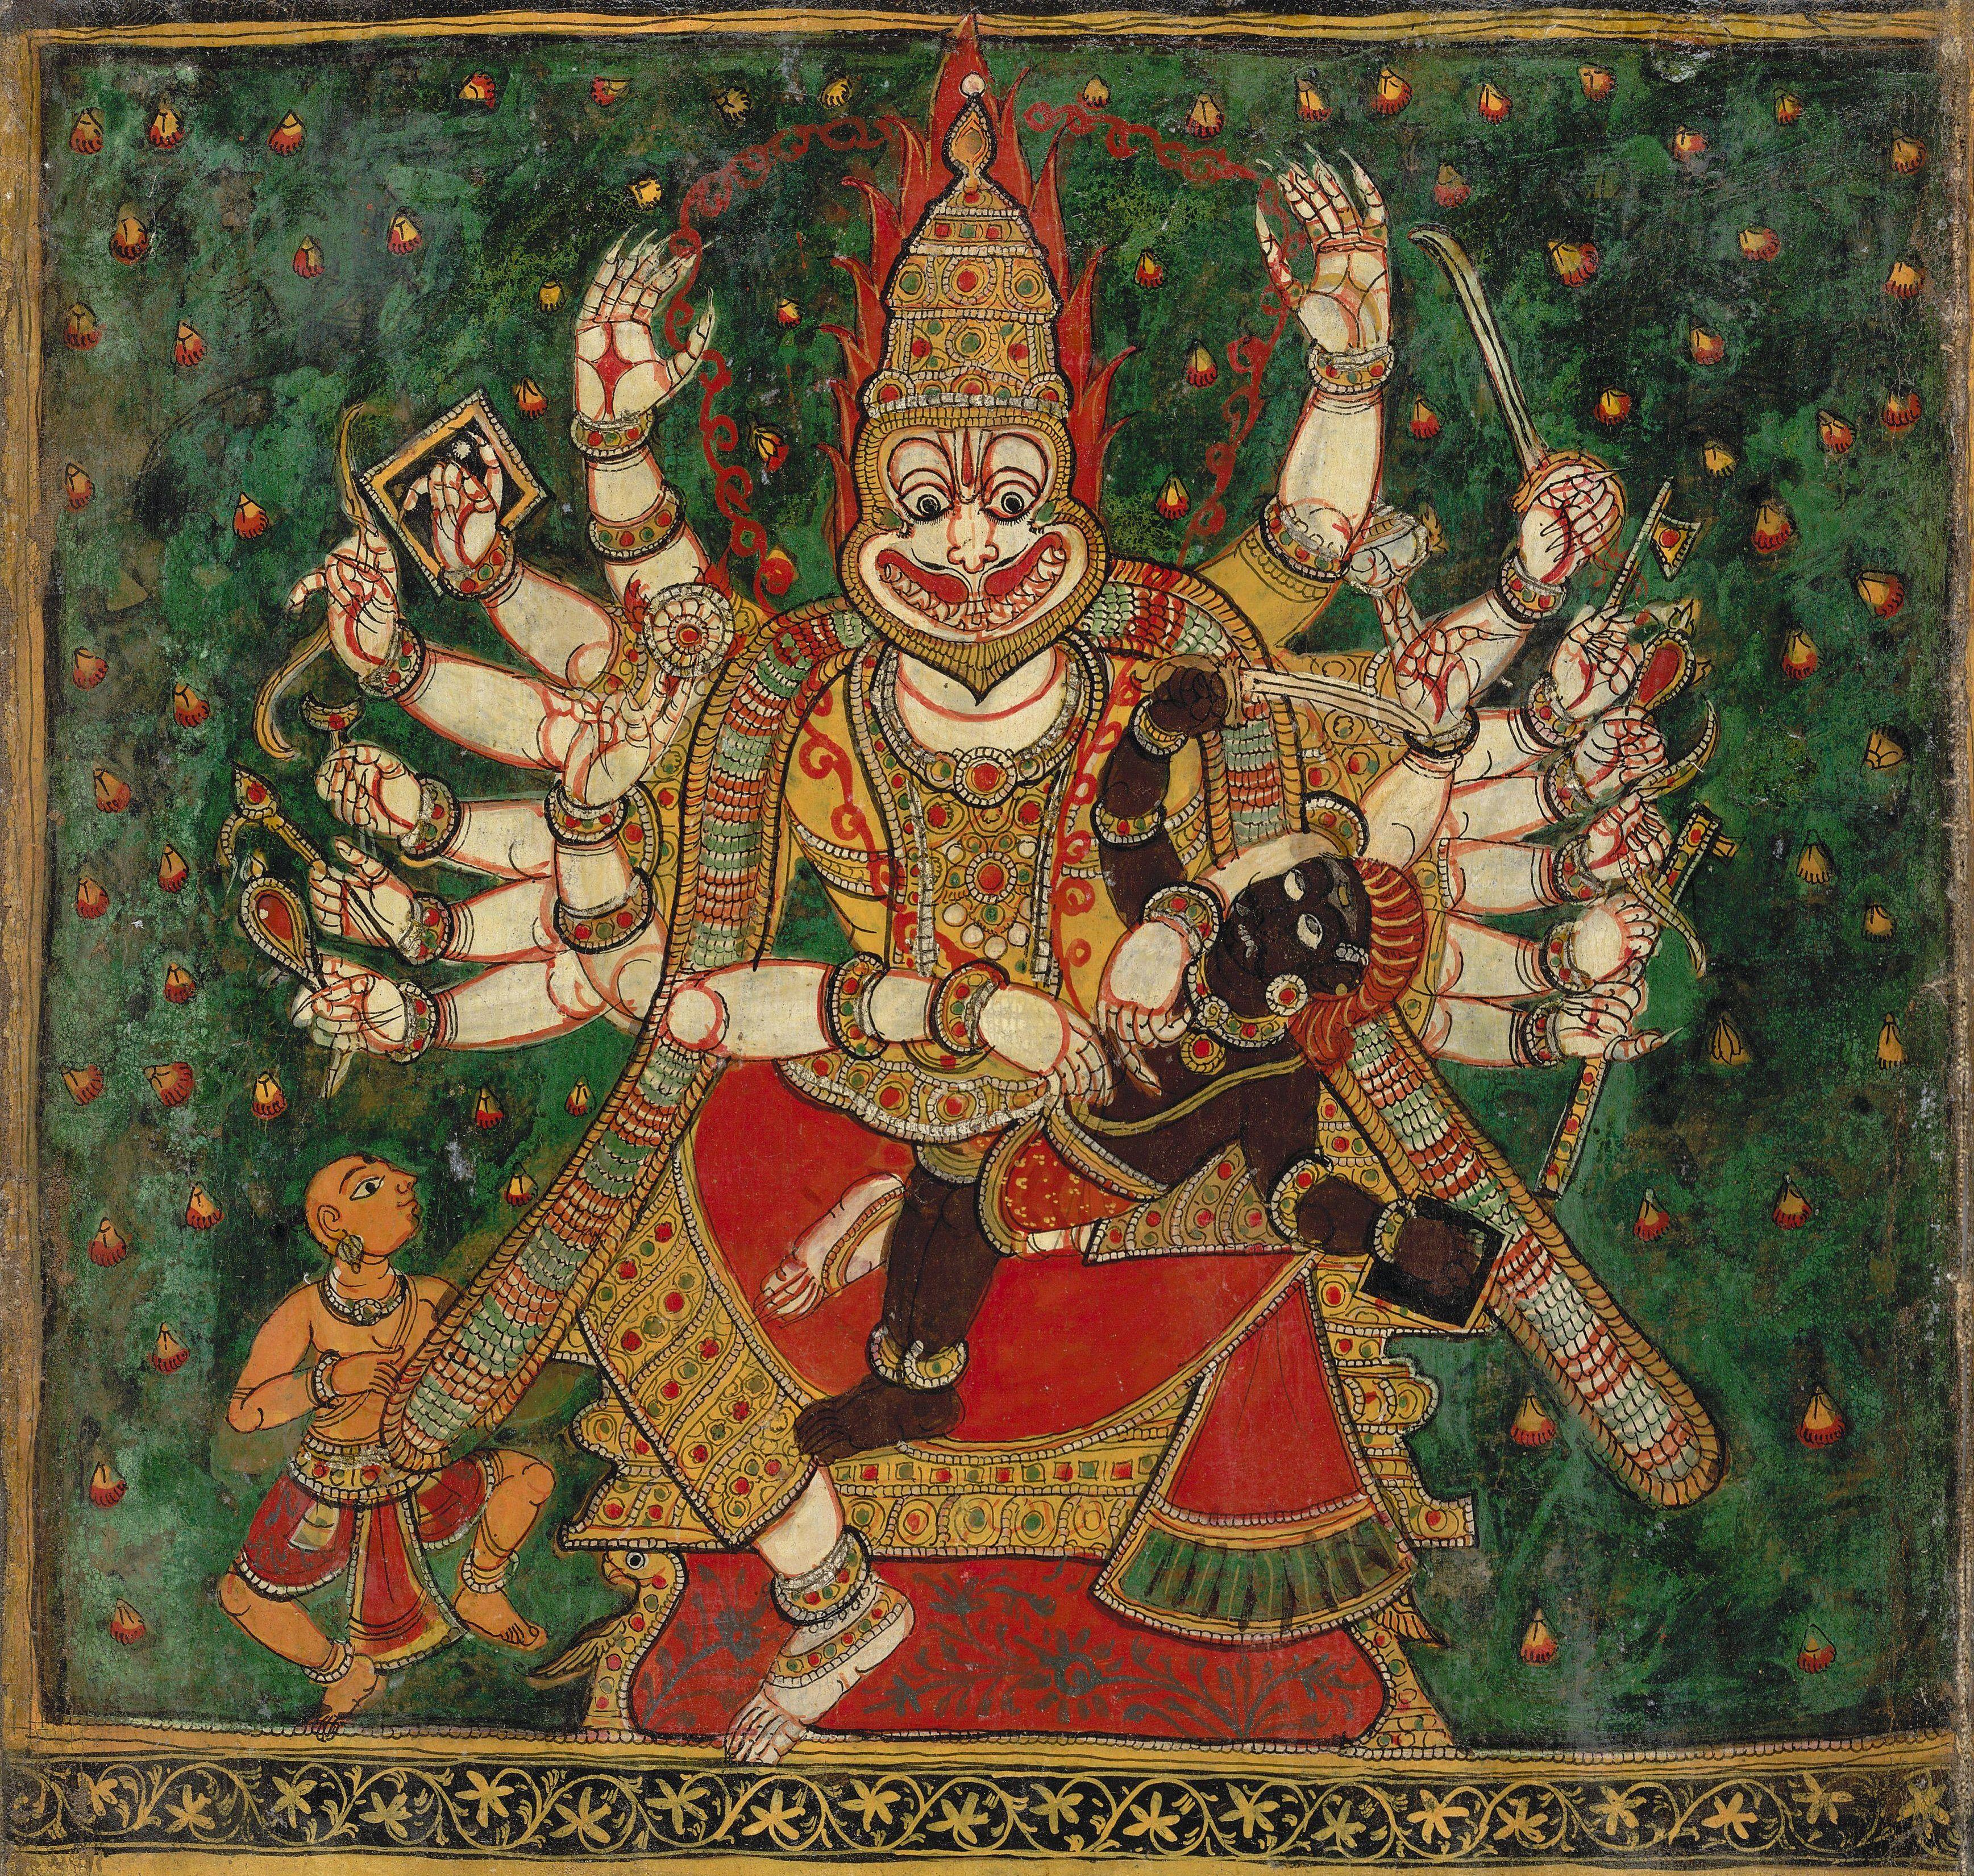 Ten avatars (incarnations) of Visnu